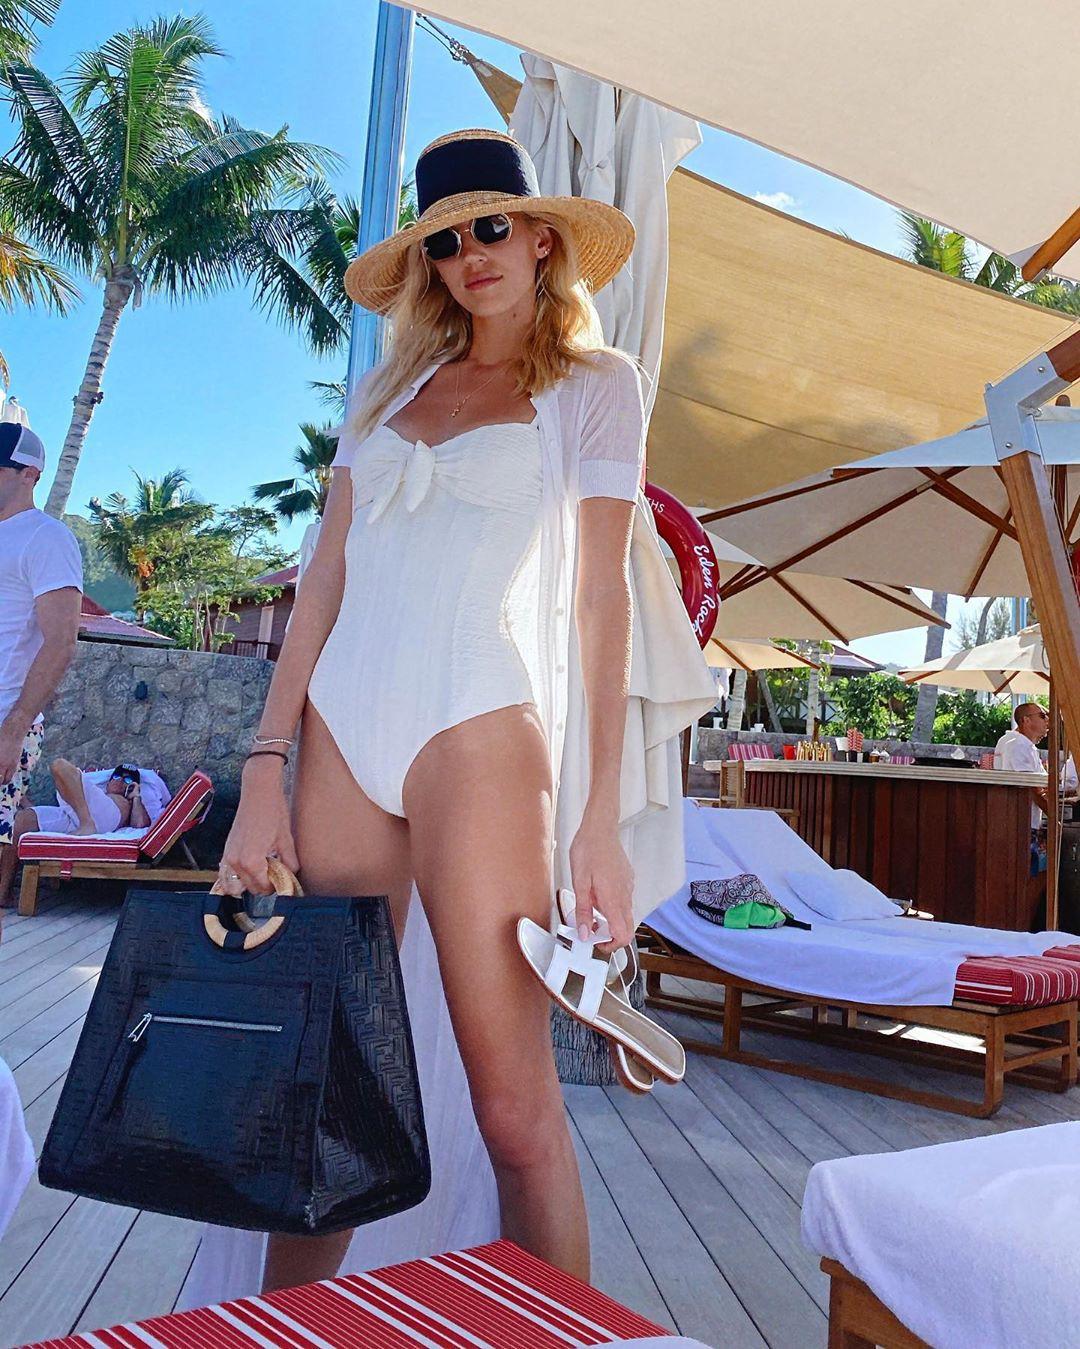 white Hot Bikini Girls Instagram 2020, legs pic, sunglasses